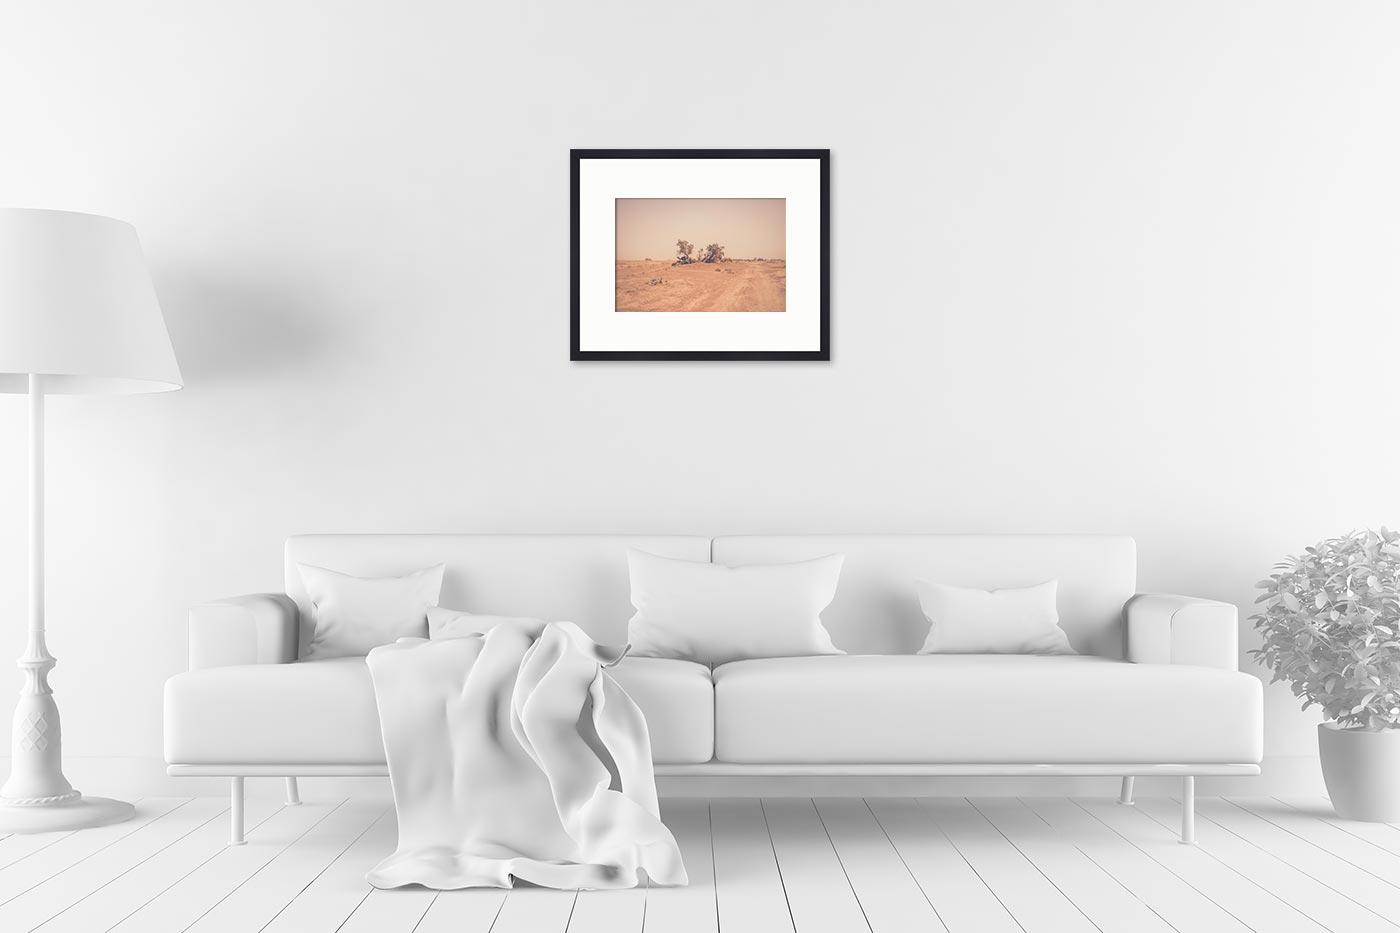 Cadre galerie 40x50 Camels Desert